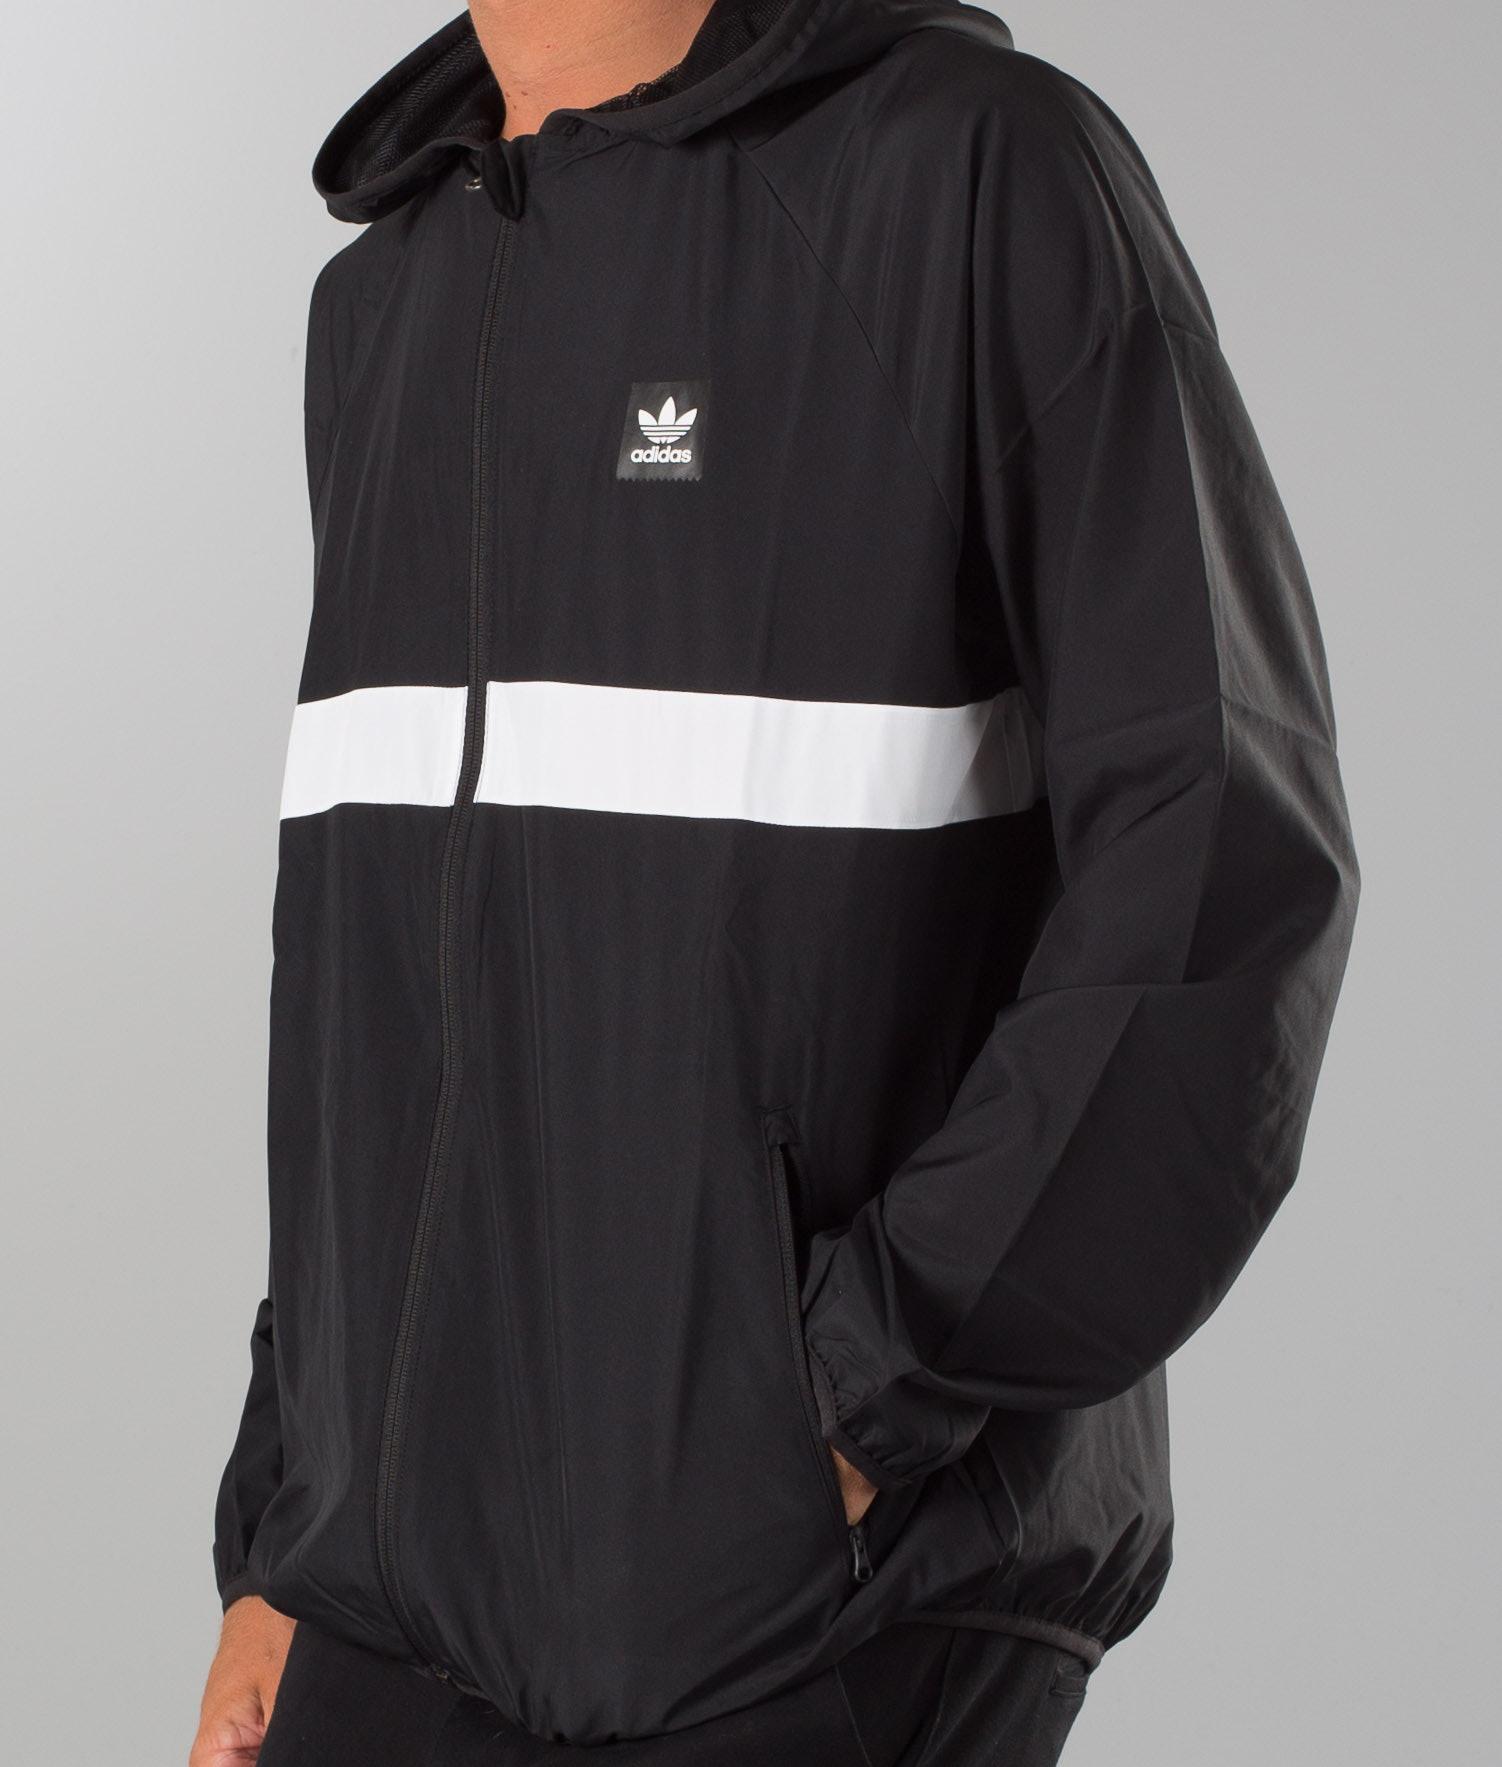 0a289c6bf Adidas Skateboarding Blackbird Wind Jacket Black/White - Ridestore.com